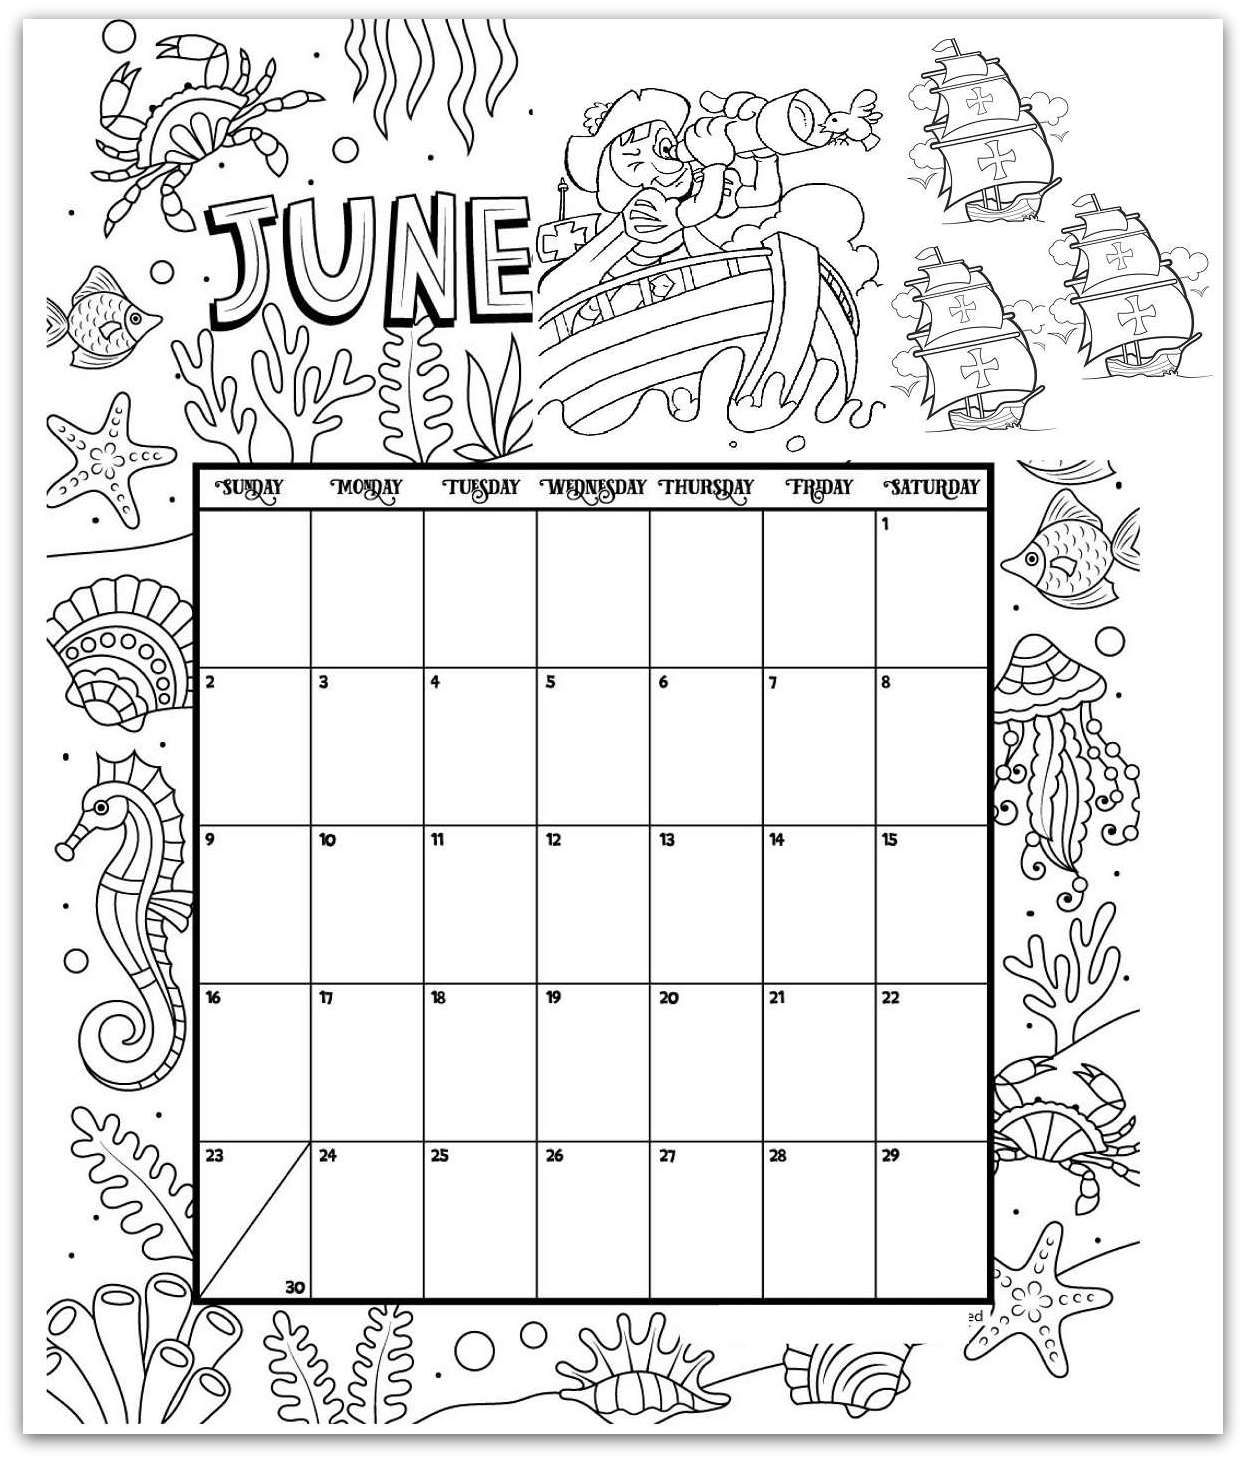 June 2019 Coloring Page Printable Calendar Kids Calendar Coloring Calendar Coloring Pages